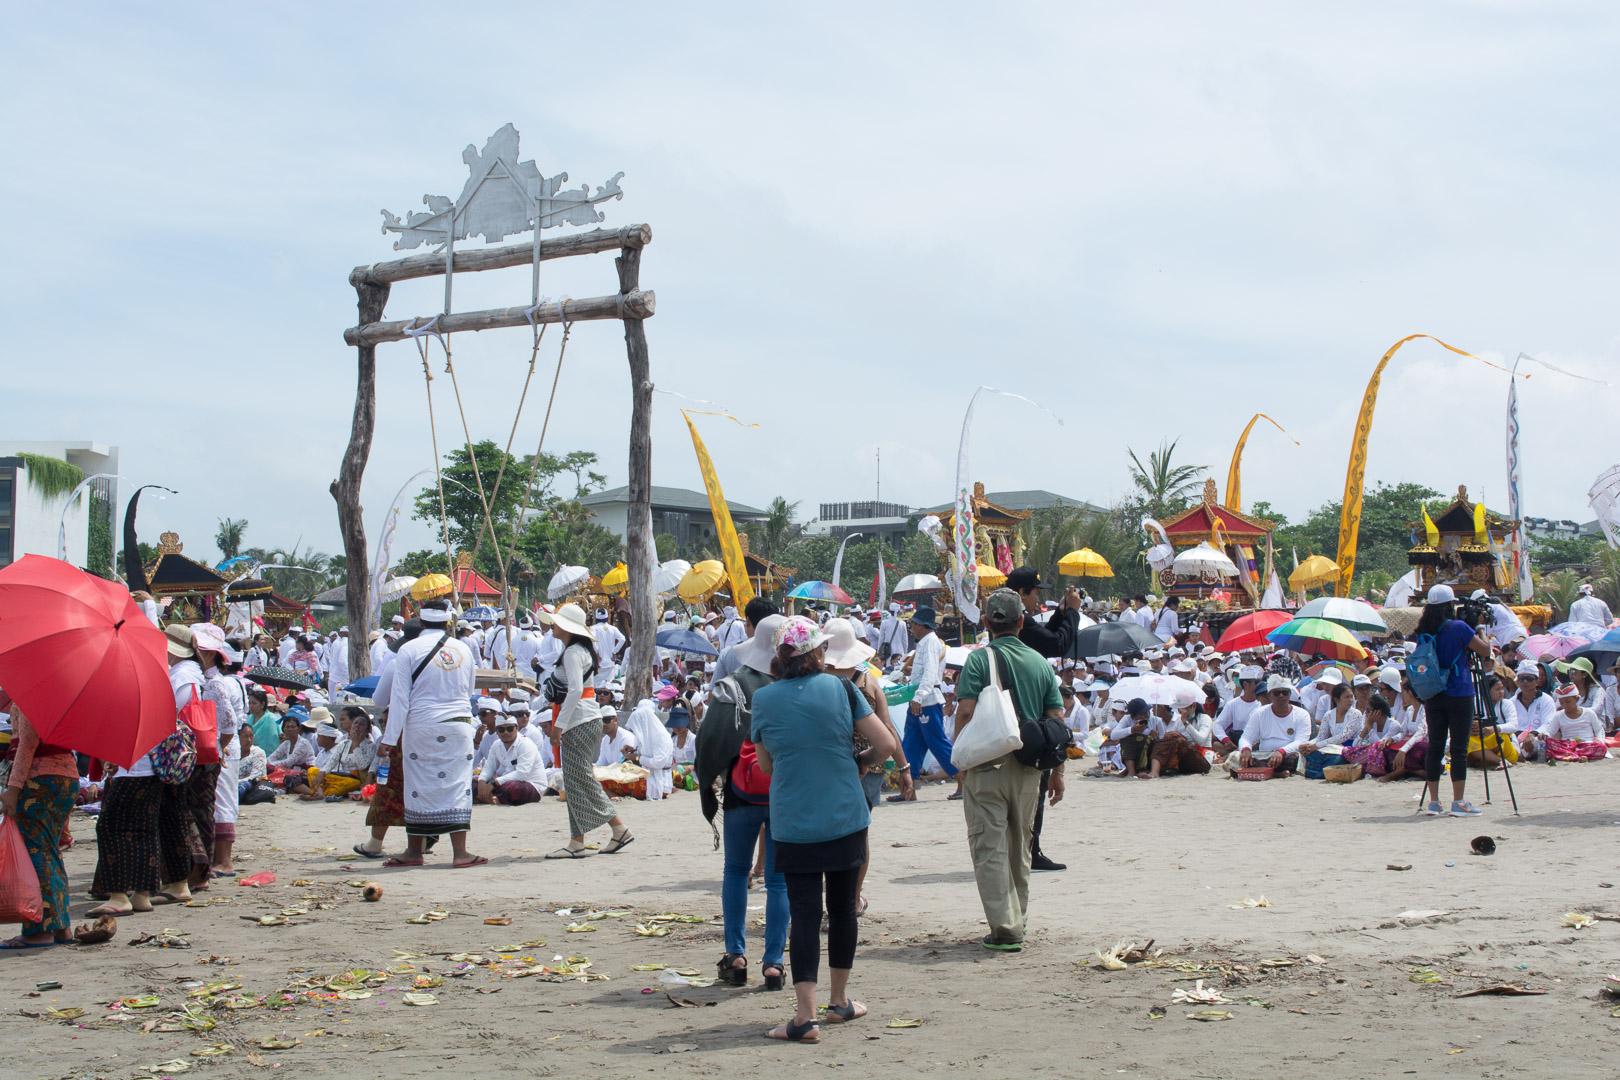 People praying towards the ocean